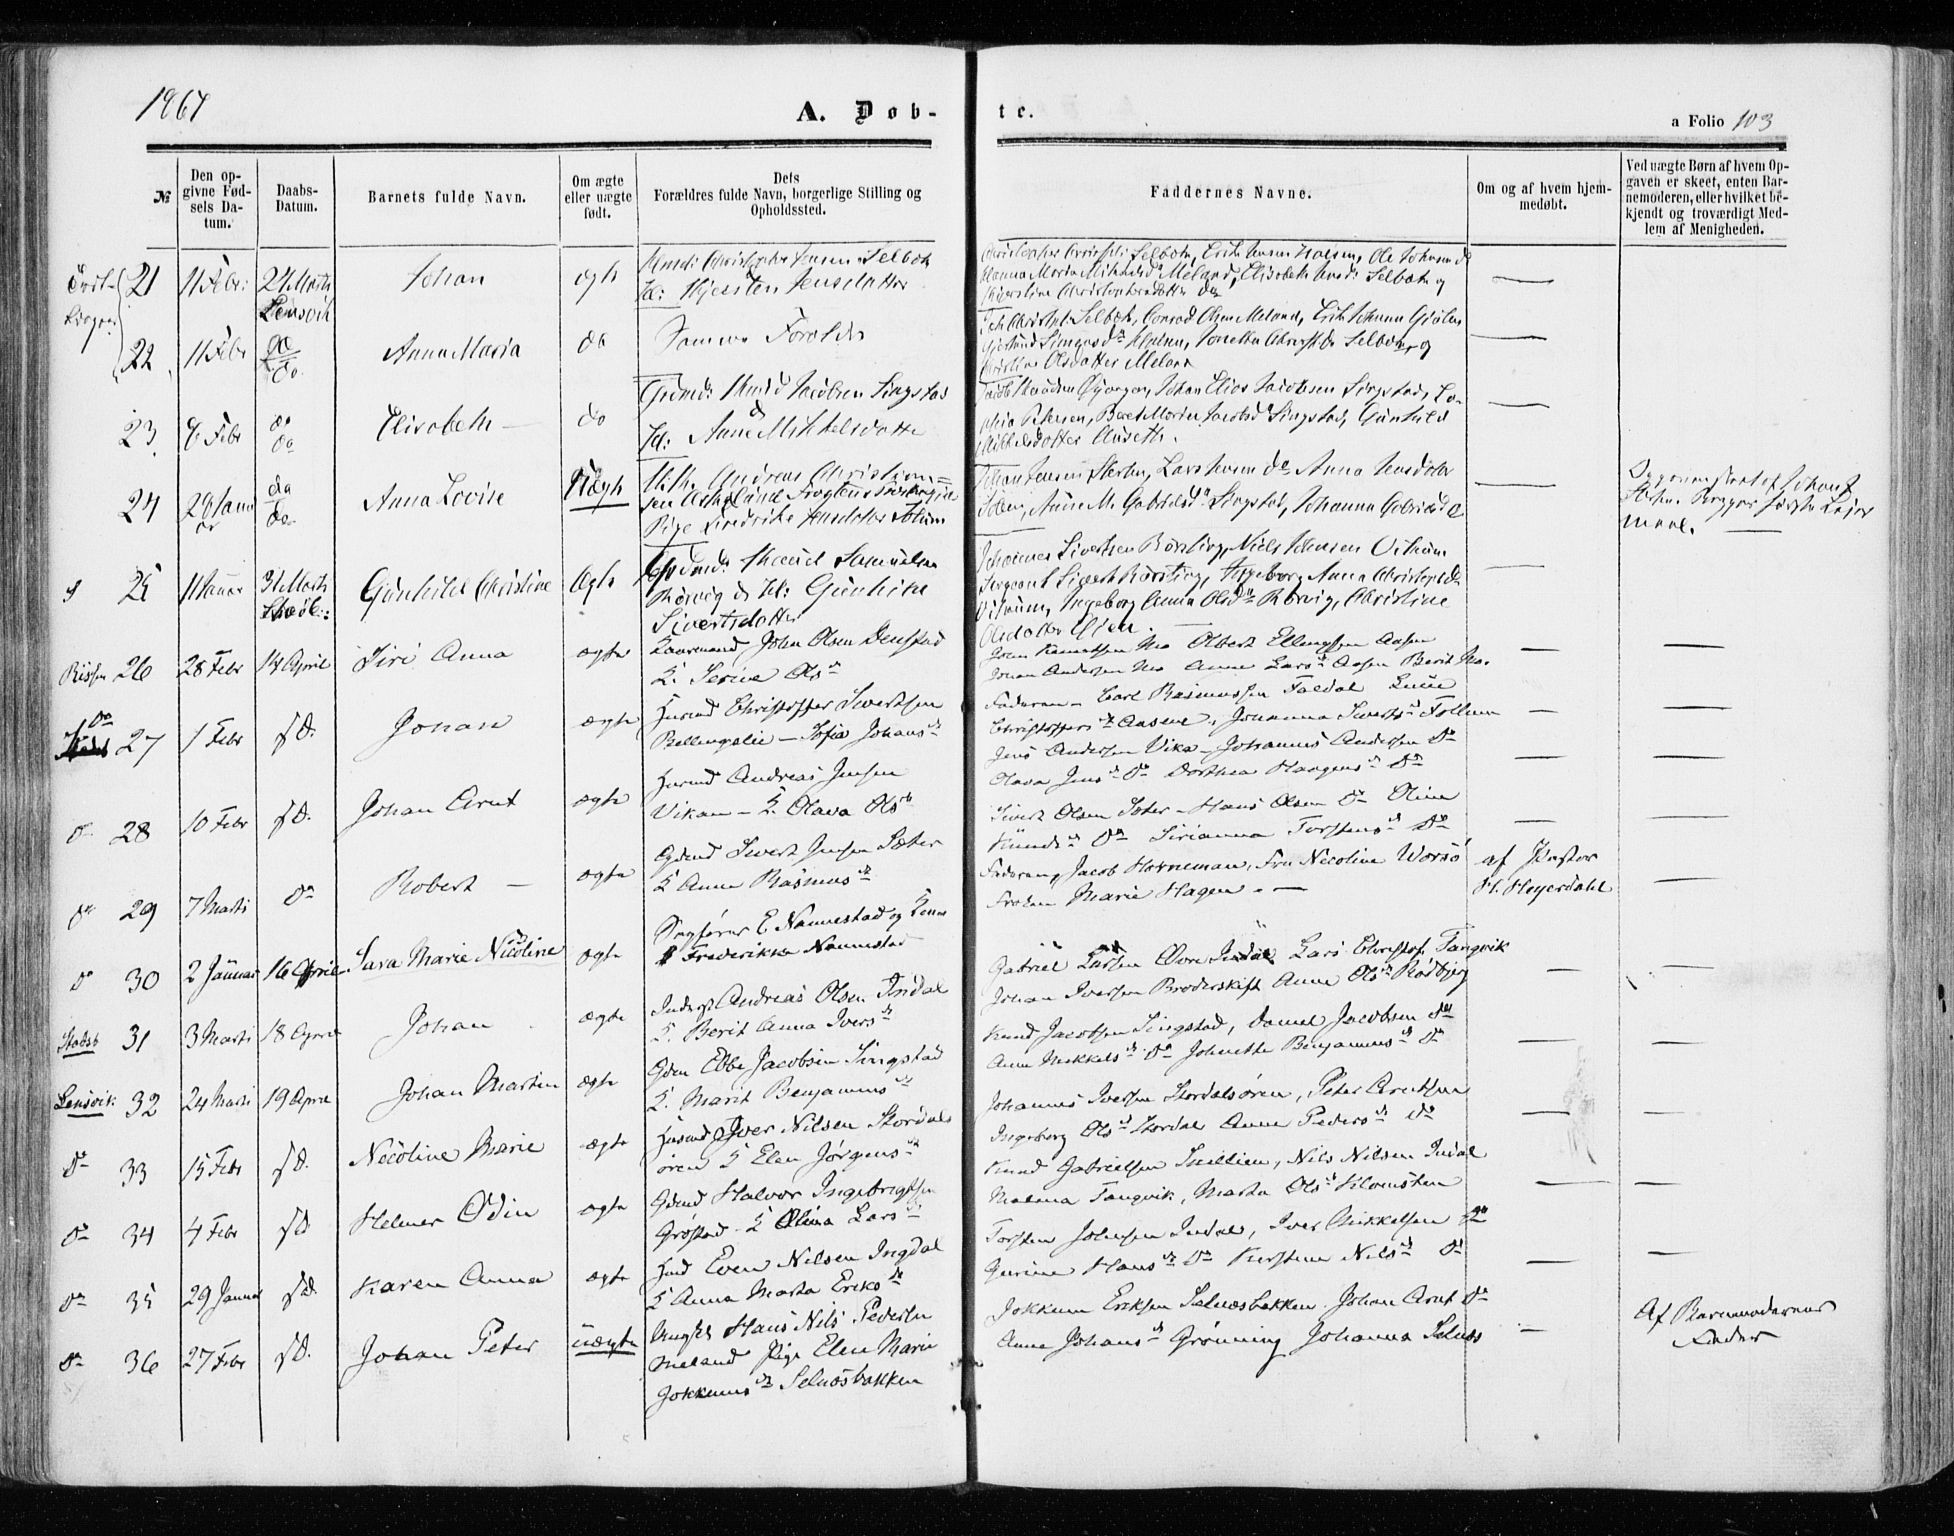 SAT, Ministerialprotokoller, klokkerbøker og fødselsregistre - Sør-Trøndelag, 646/L0612: Parish register (official) no. 646A10, 1858-1869, p. 103